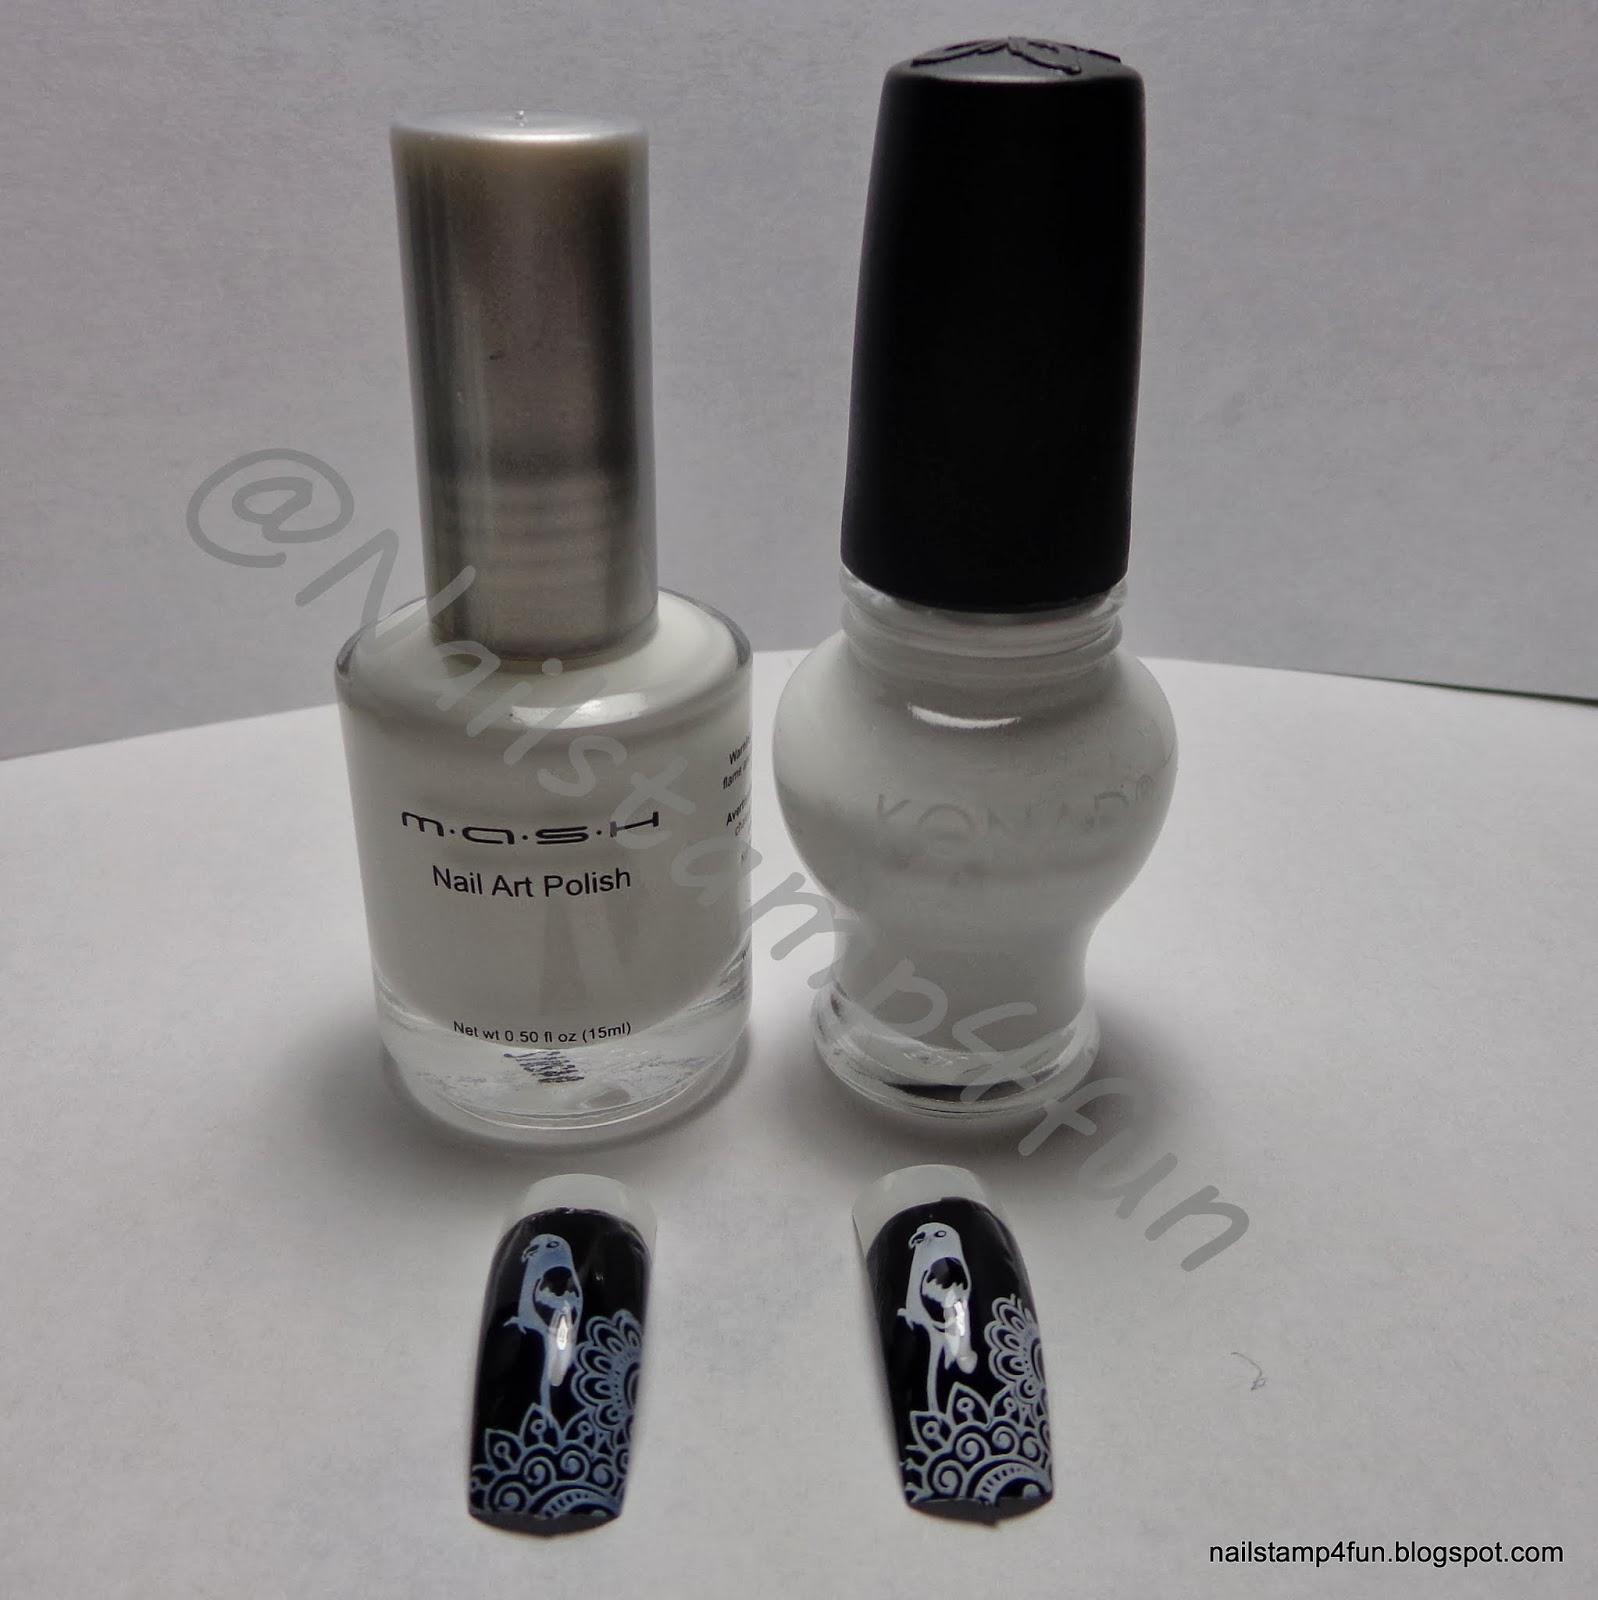 Nail Stamp 4 Fun: Swatches of Black & White Nail Stamping Polishes